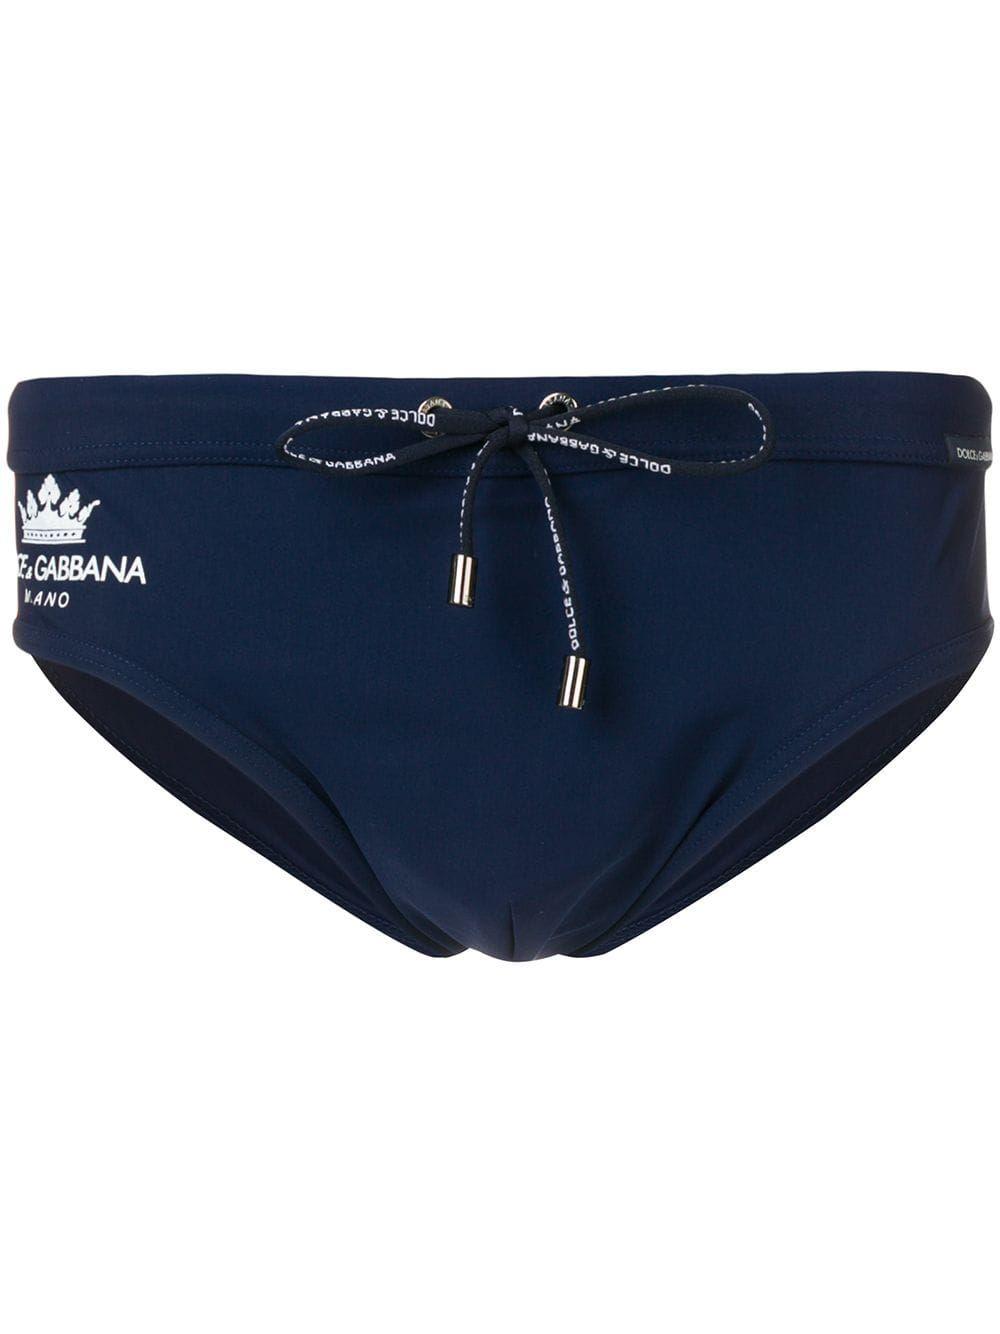 569c66d7ca Dolce & Gabbana logo swim trunks - Blue in 2019   Products   Dolce ...